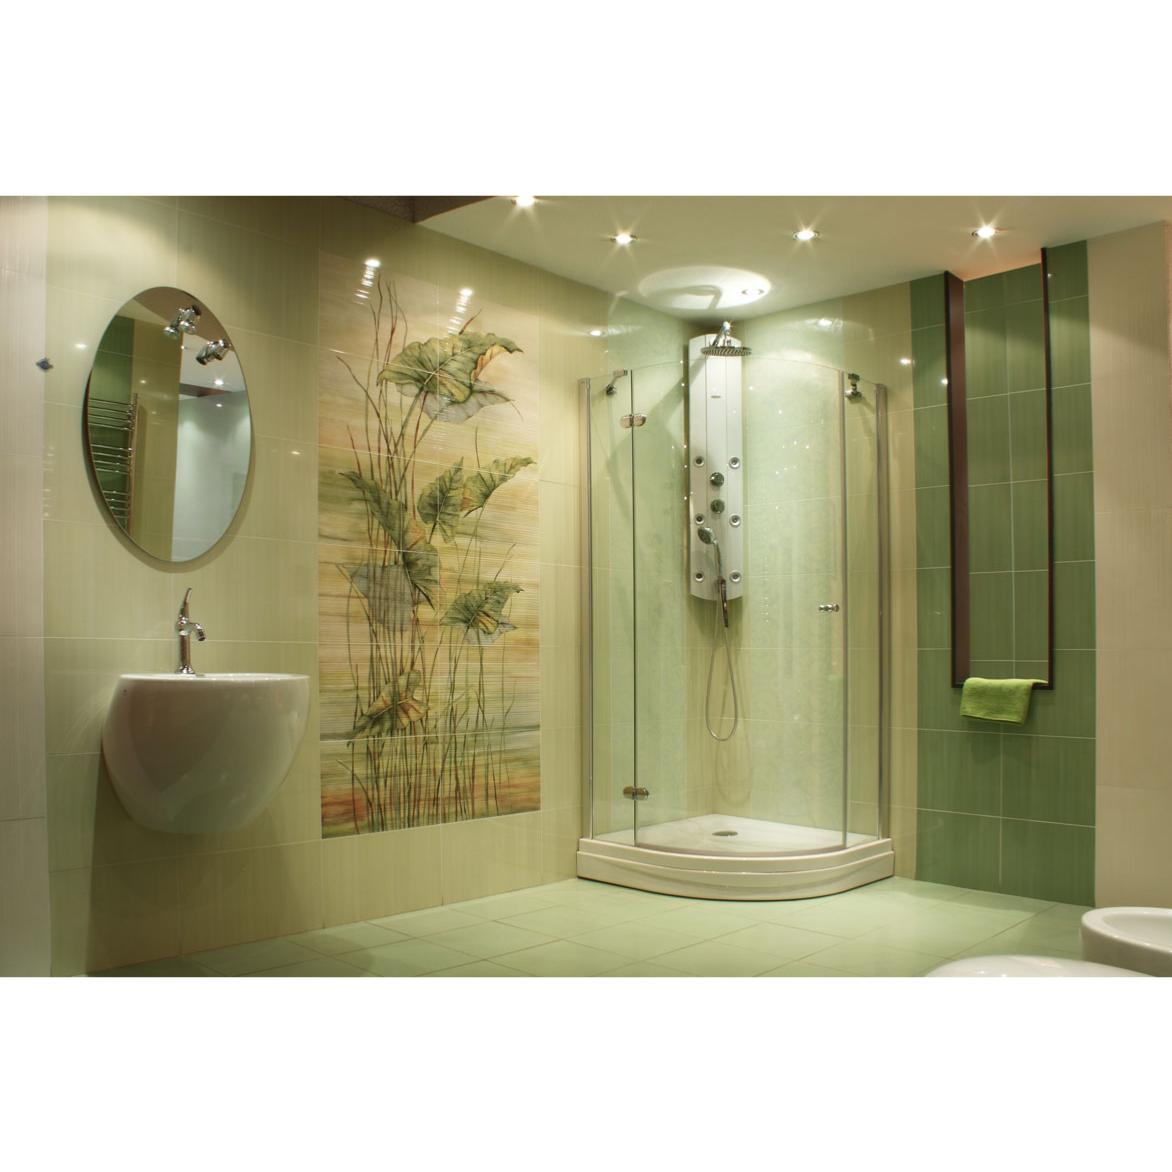 Spot salle de bain encastrable luminaire salle de bain for Spot ip44 salle de bain